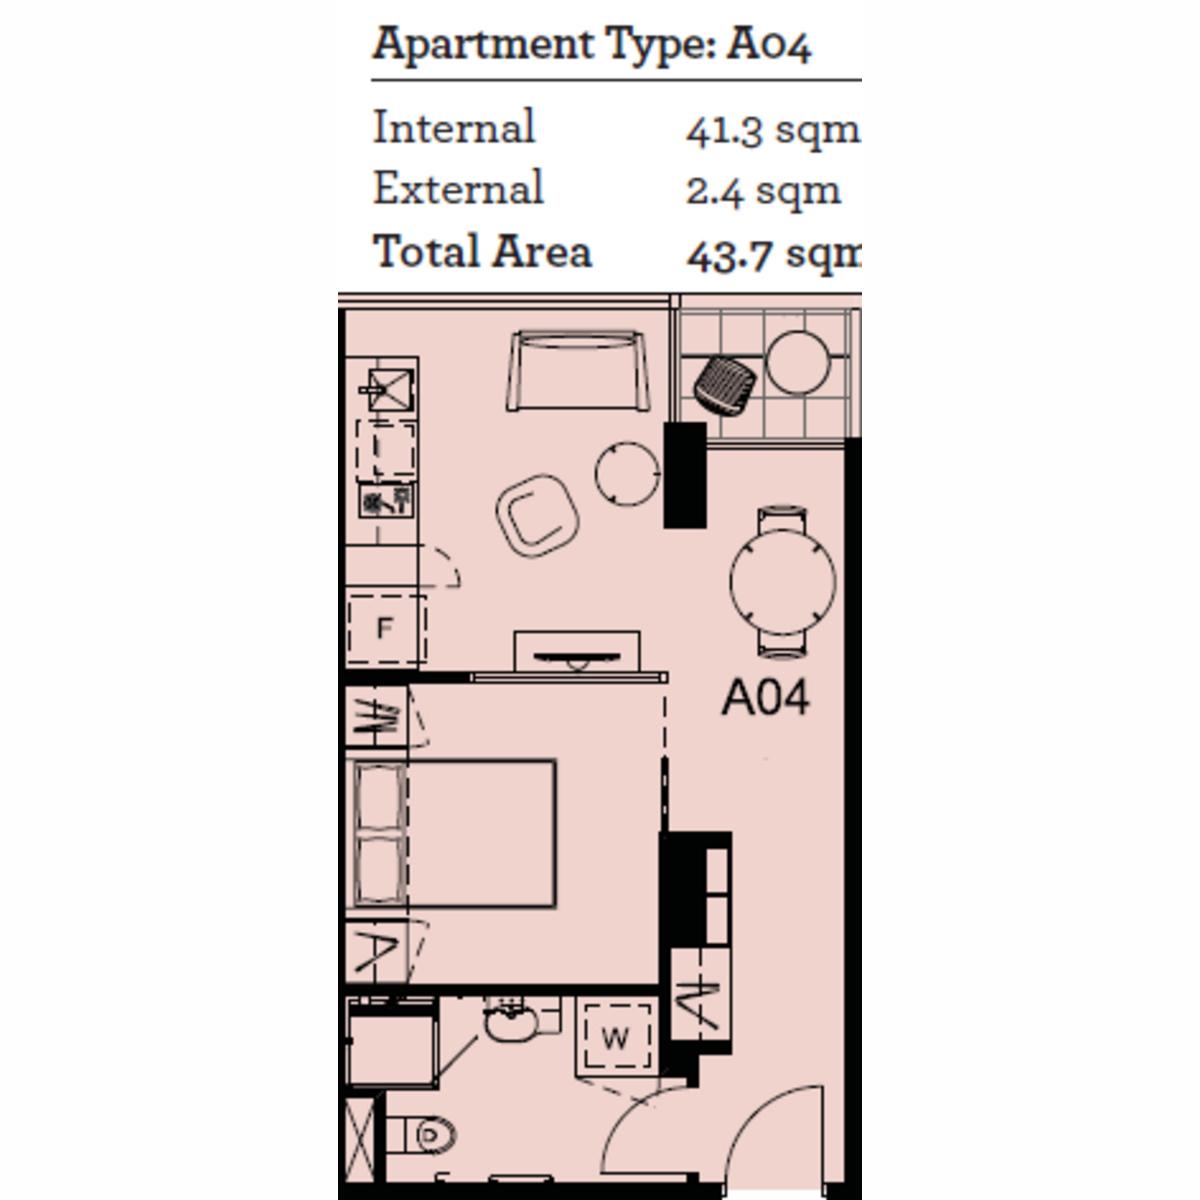 1 bedroom Gem at 18th Floor on the Paris End of CBD